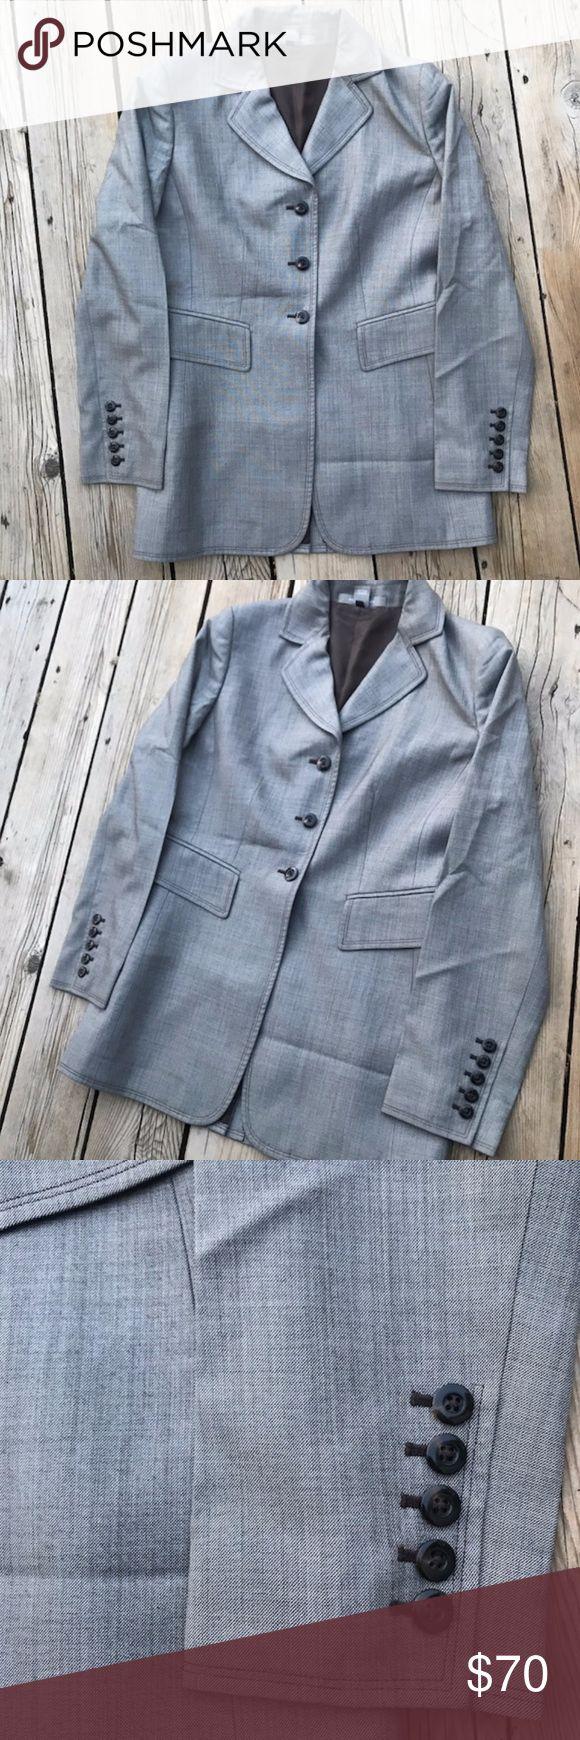 "Ellen Tracy Wool & Silk Blazer -- Brown -- Size 6 Ellen Tracy blazer, brown and white and a size 6. Blazer is 83% wool and 17% silk. The blazer is 29 1/2"" long. Ellen Tracy Jackets & Coats Blazers"